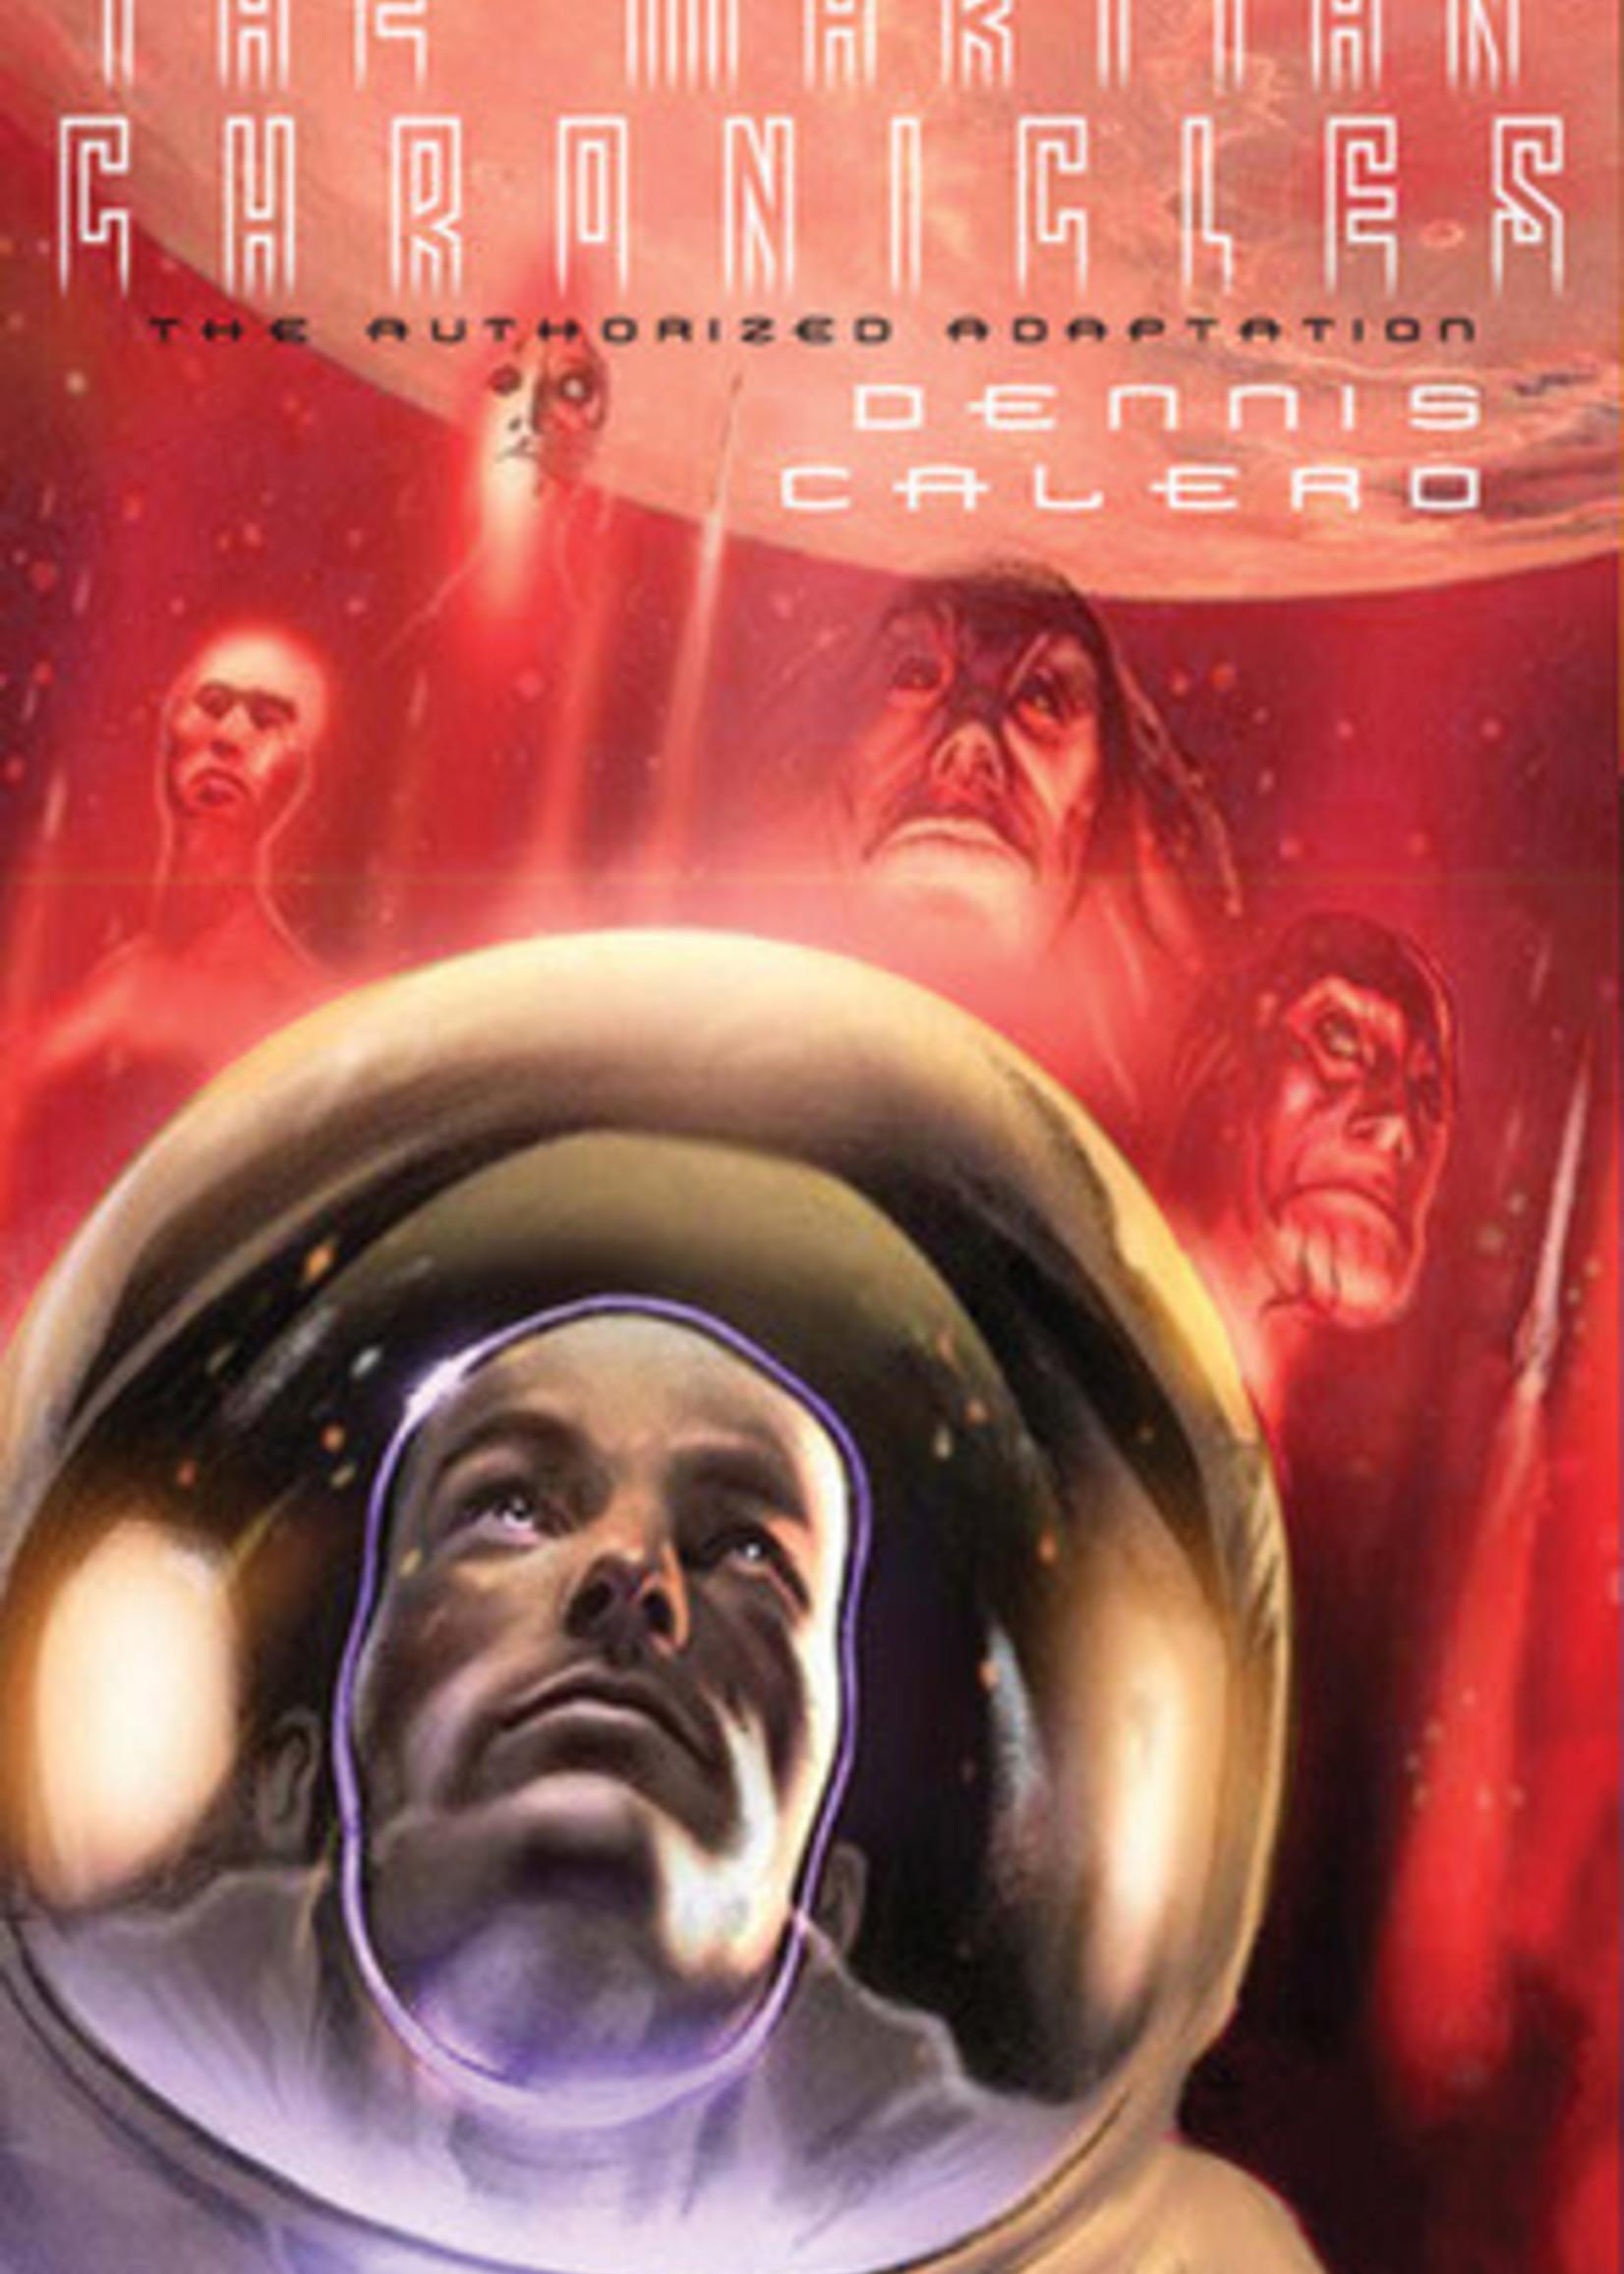 Ray Bradbury's the Martian Chronicles: The Authorized Adaptation by Dennis Calero